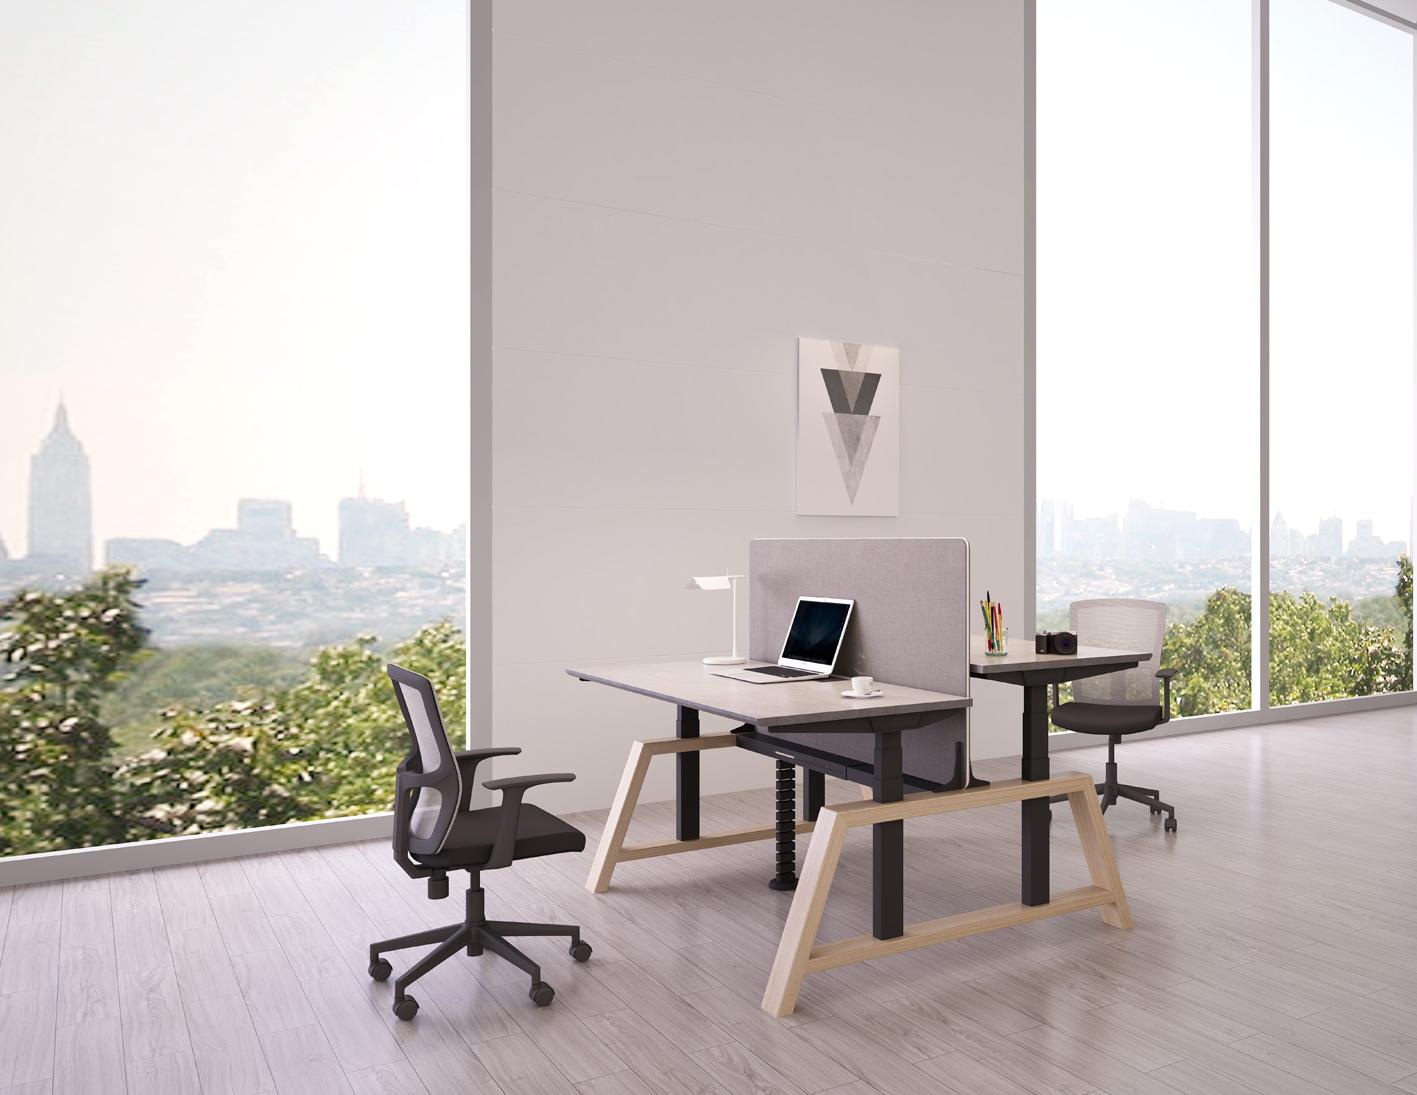 Dubbel Elektrisch Zit-Sta Bureau - OakDesk